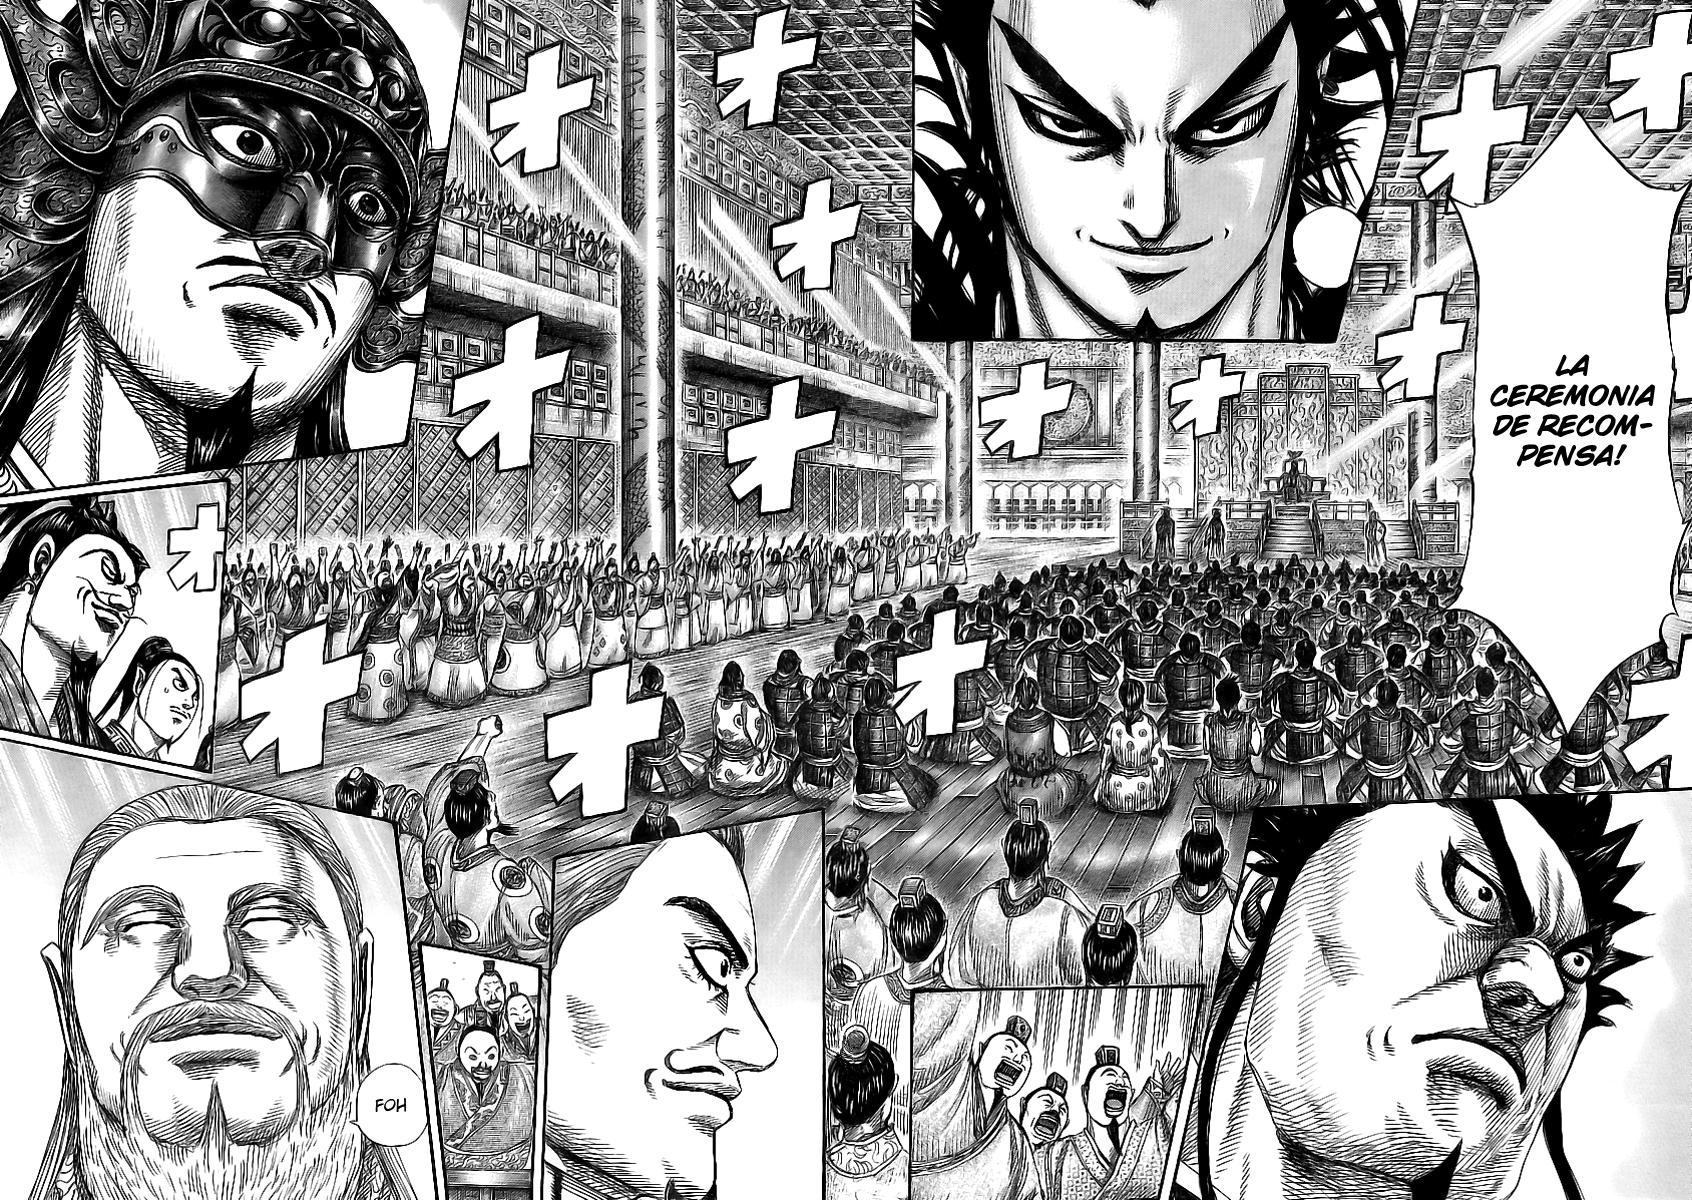 http://c5.ninemanga.com/es_manga/19/12307/363820/50f9cebd487ed47cfb20dffc6459603d.jpg Page 5